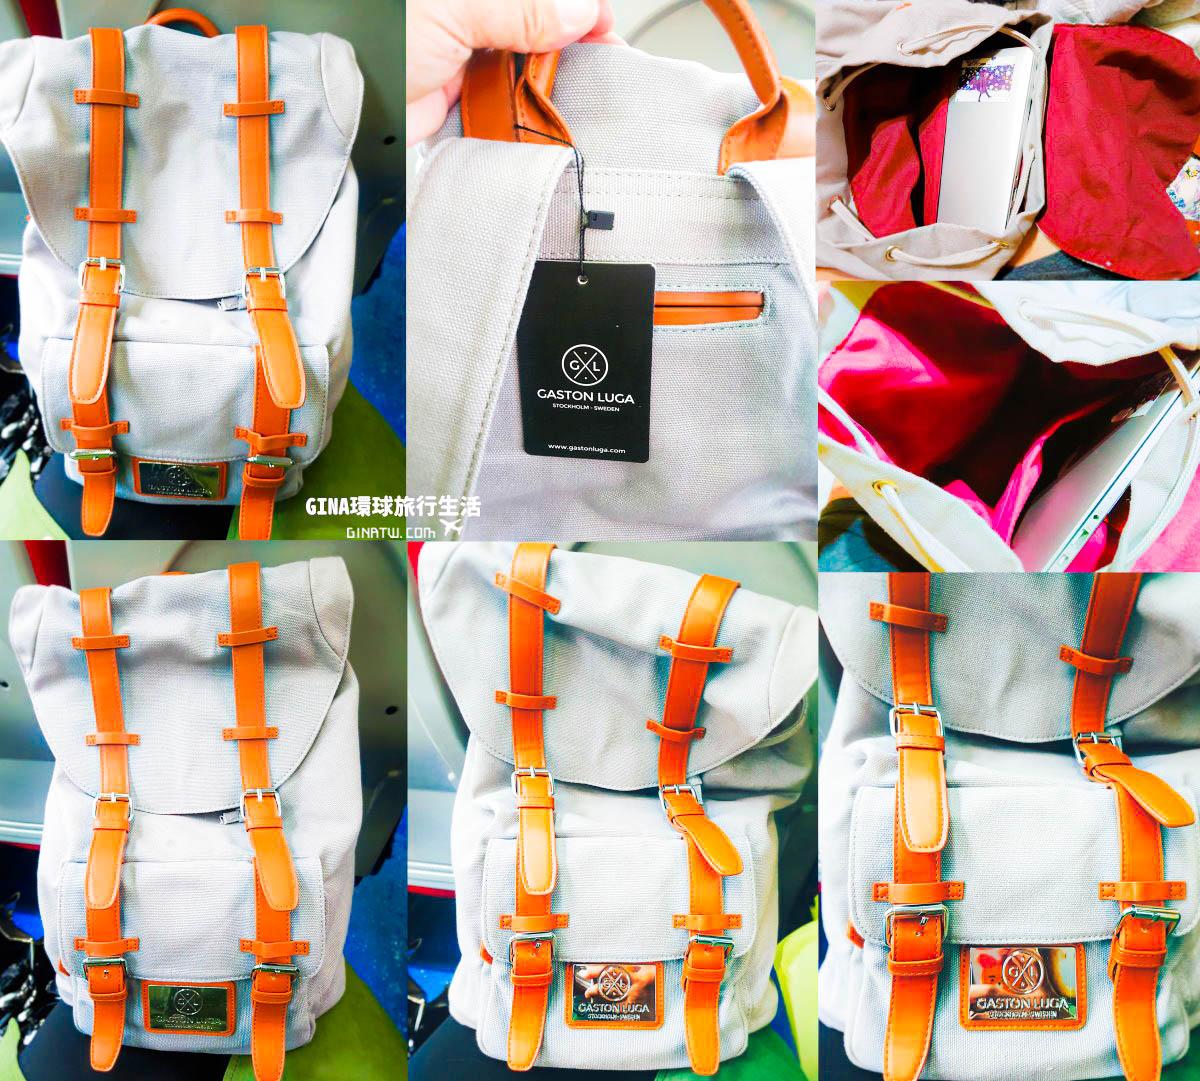 【2021Gaston Luga折扣碼】開箱評價!北歐瑞典時尚包包、新款防水包|全球免運優惠|Gaston Luga專櫃 @GINA環球旅行生活